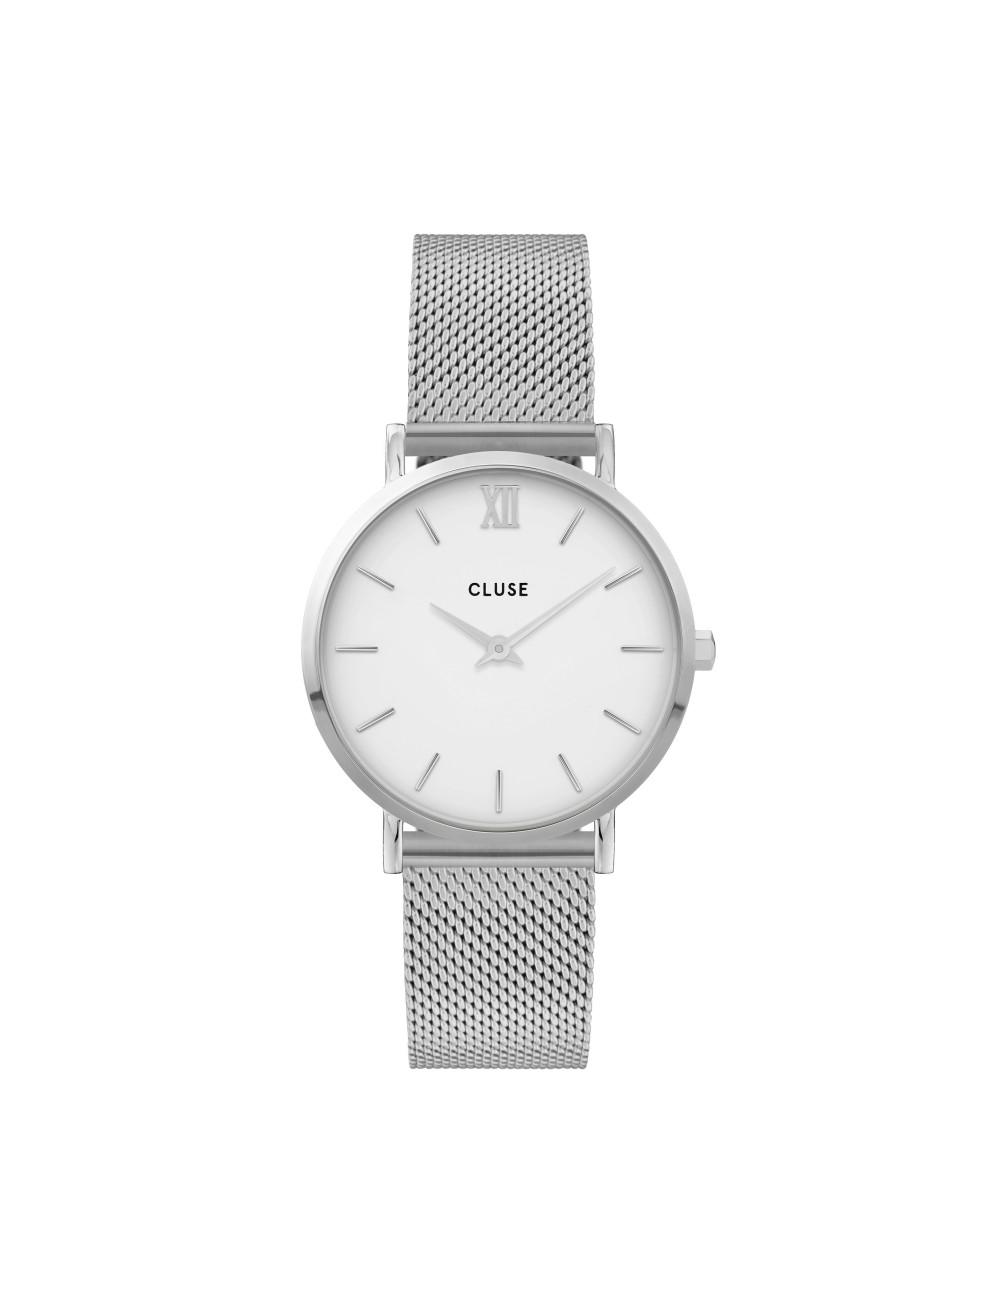 Cluse -Cluse Minuit Mesh White -CW0101203002